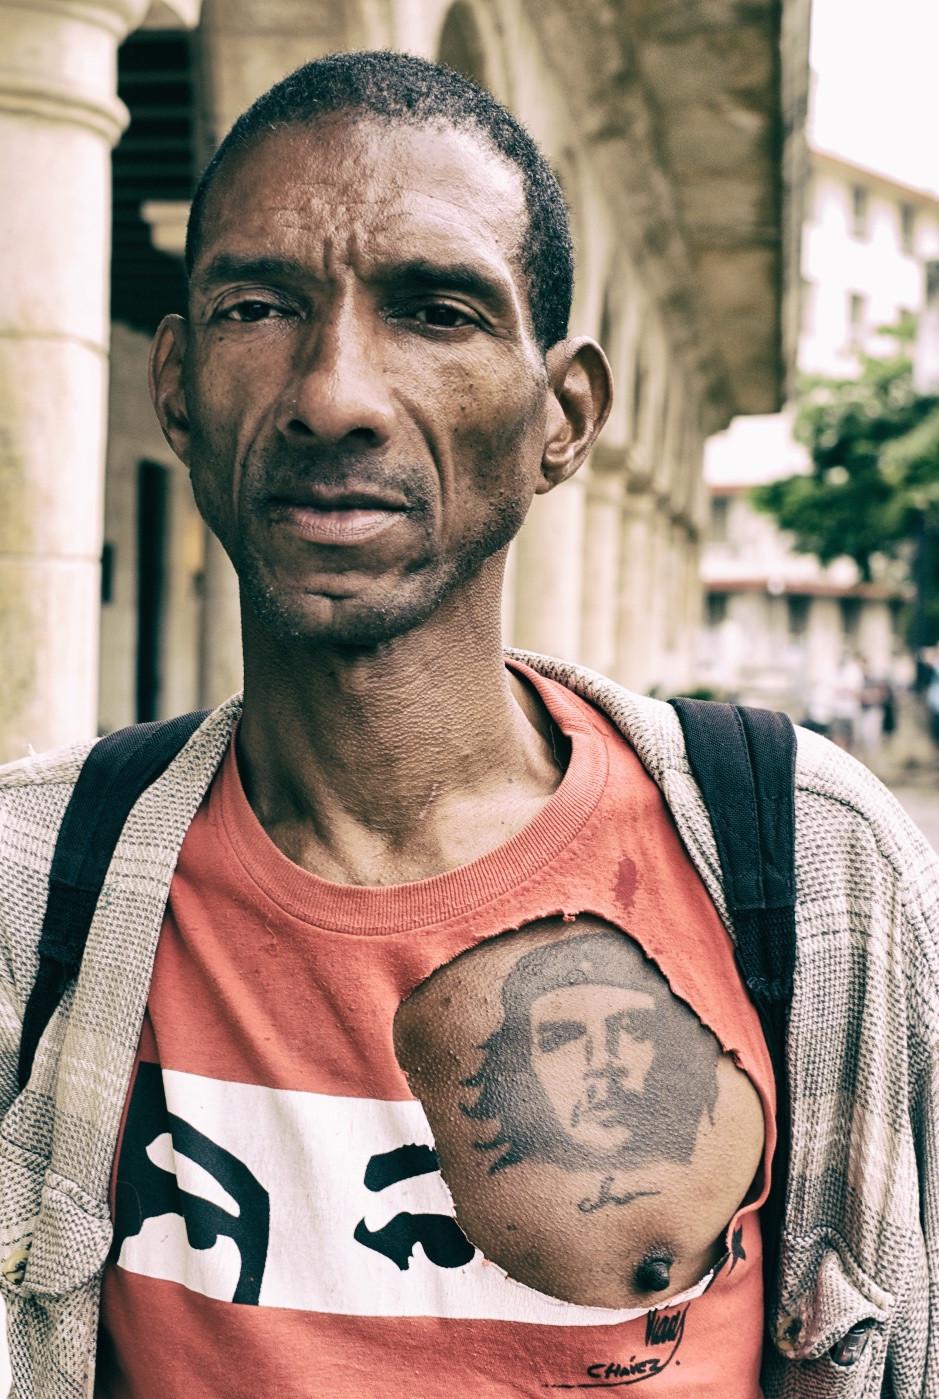 Man with Che tattoo, Havana